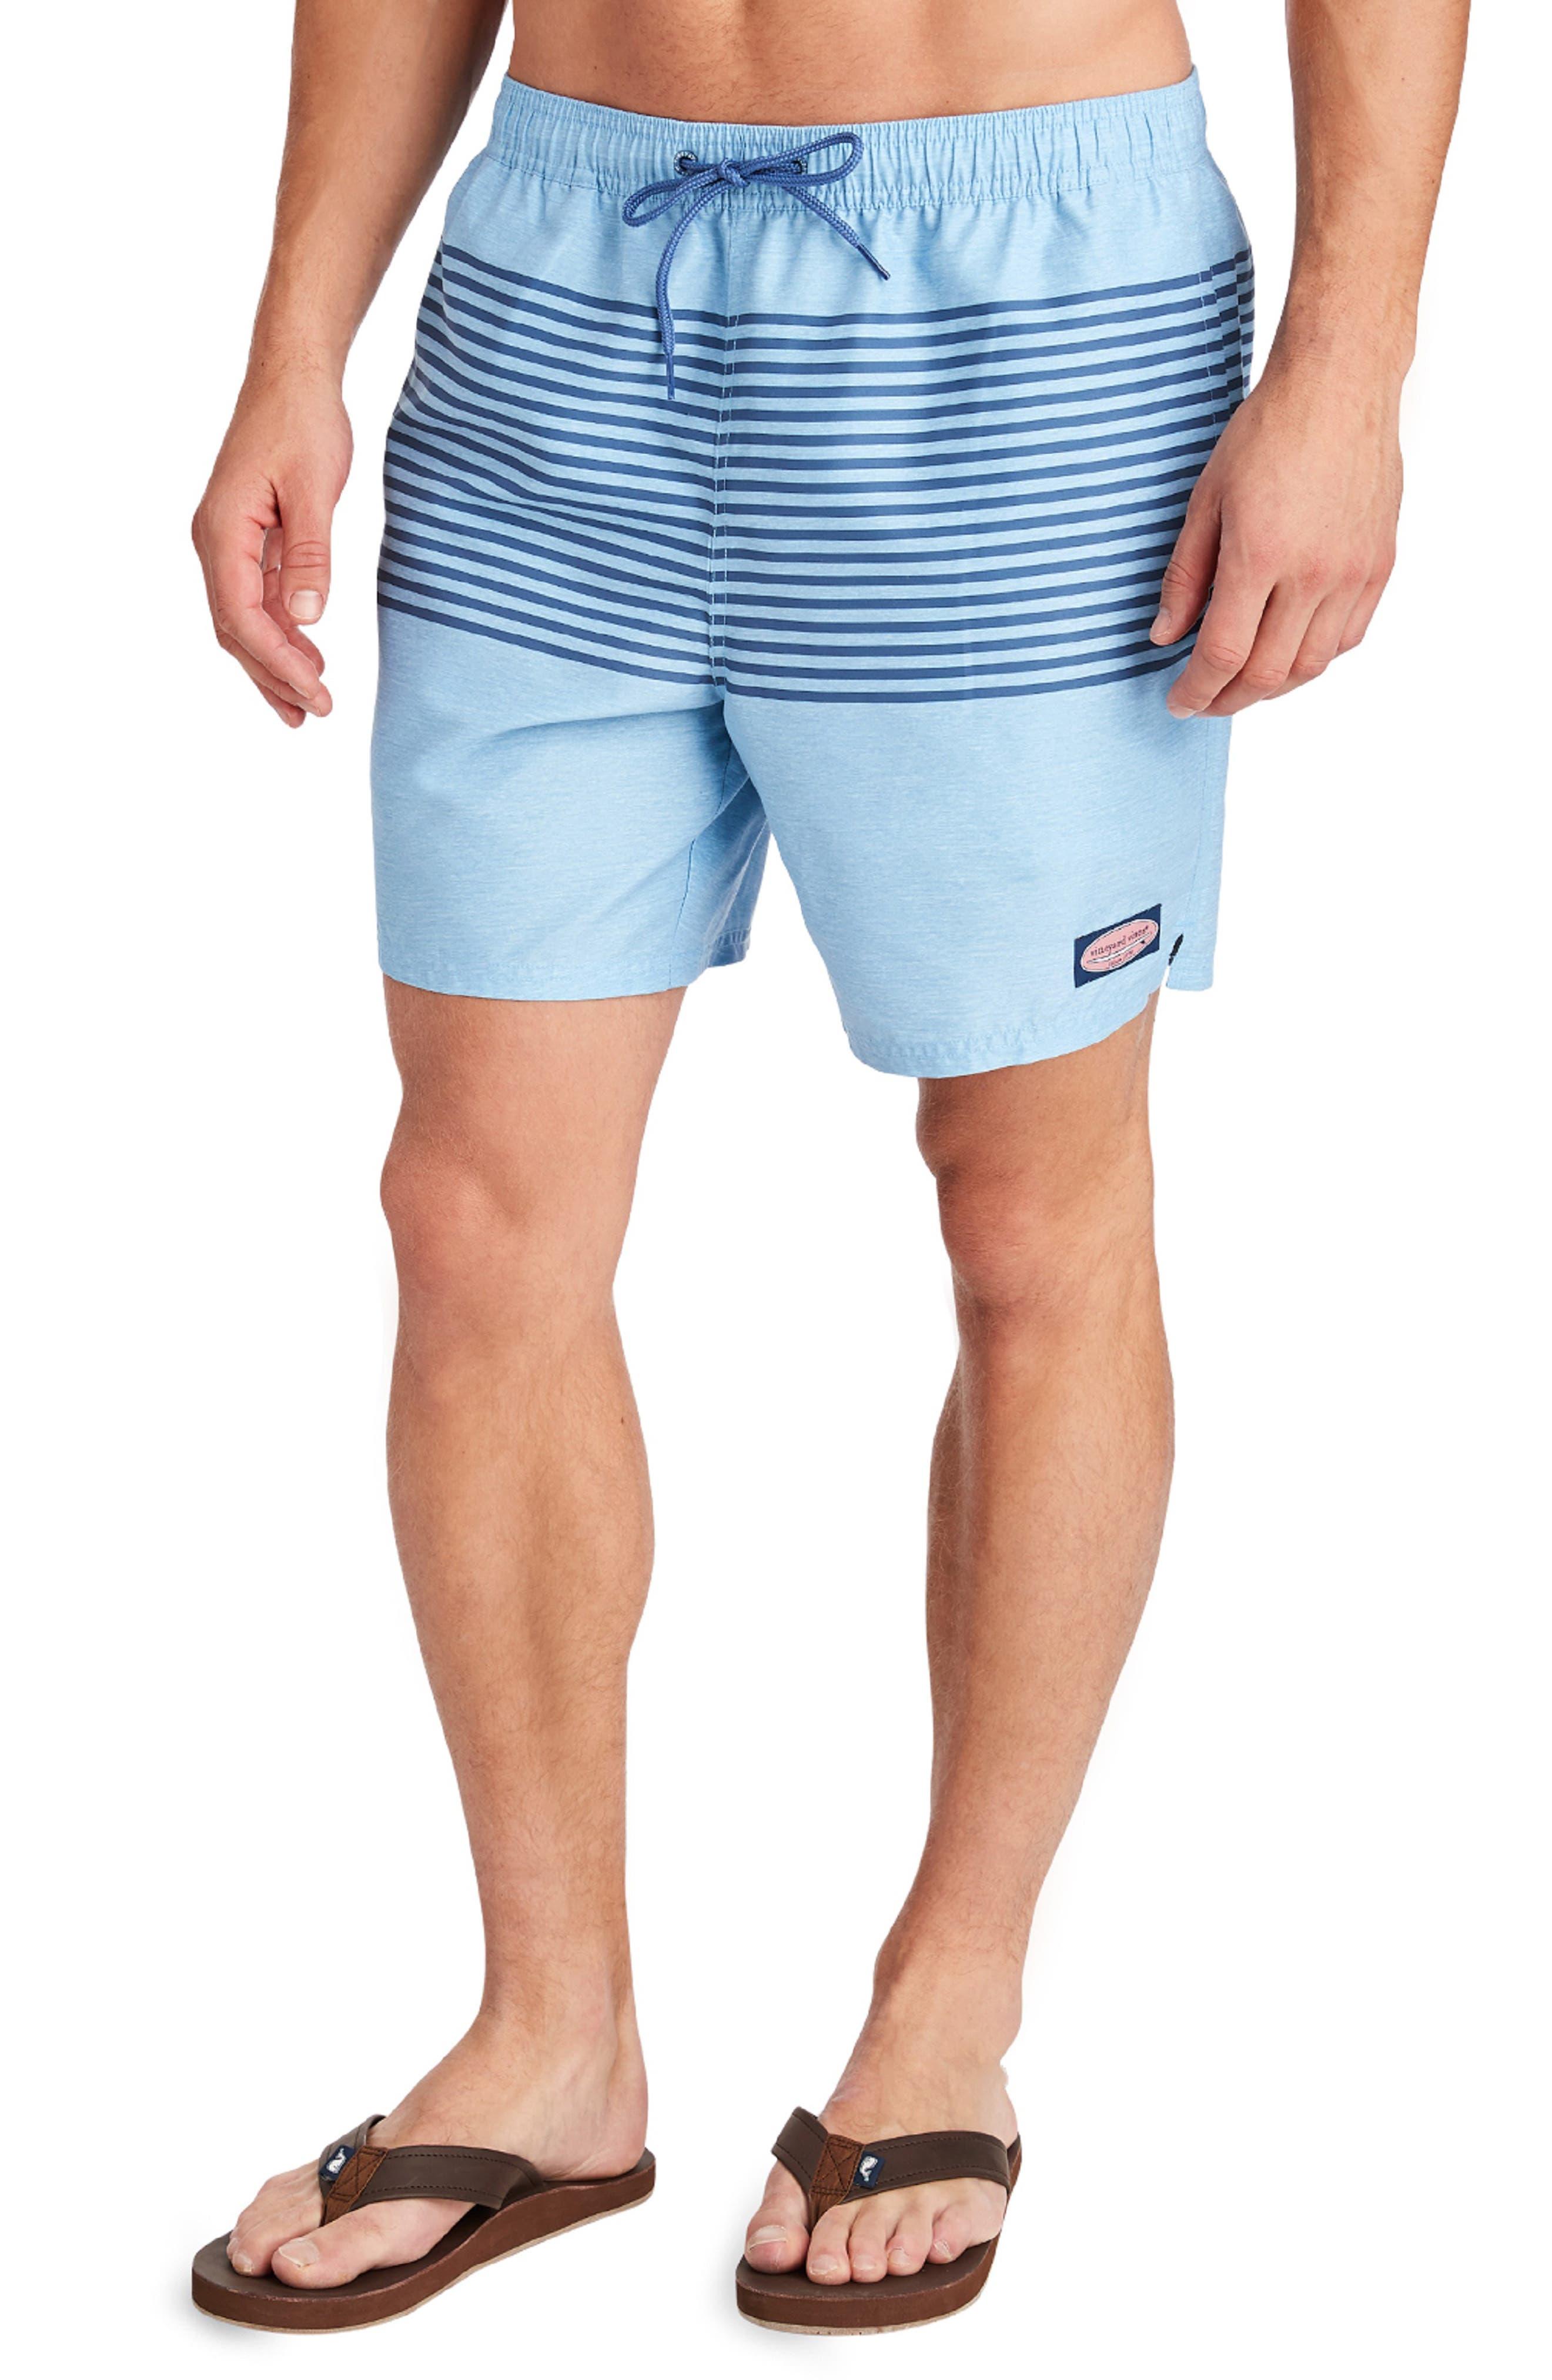 Vineyard Vines Heathered Stripe Chappy Swim Trunks, Blue